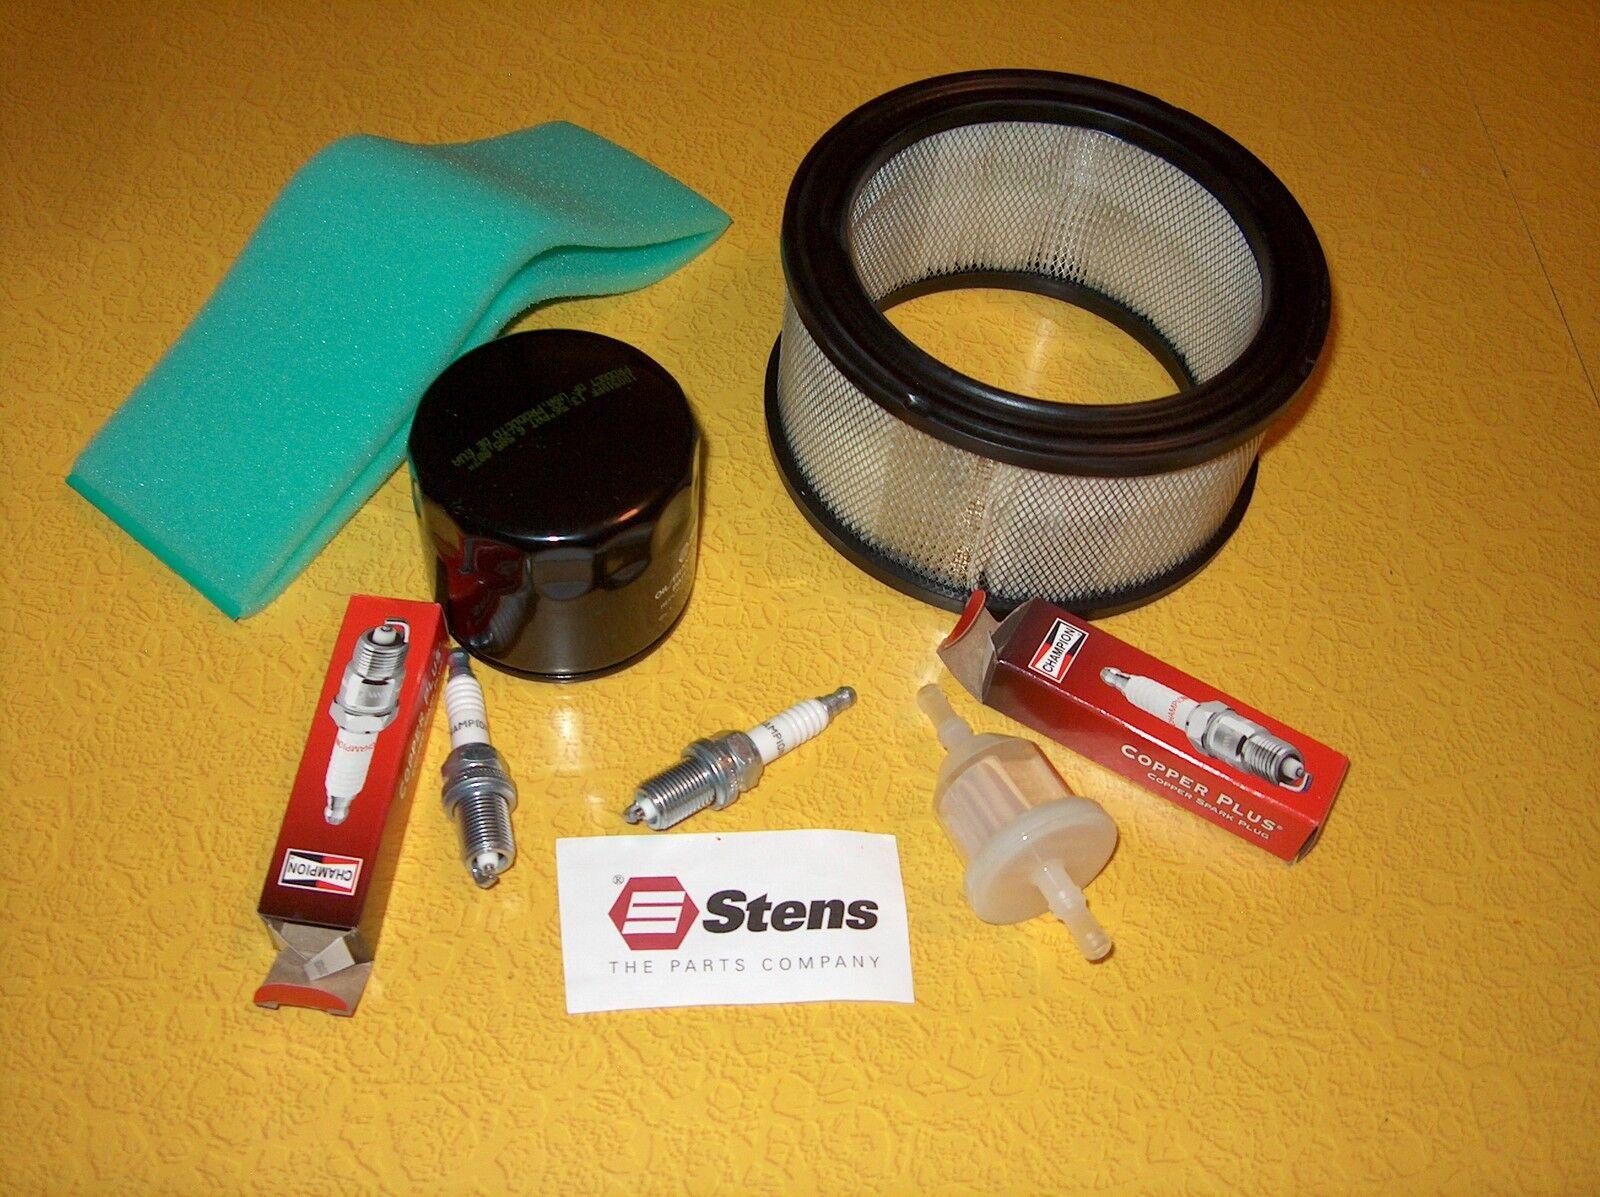 john deere k series 17 hp parts kit car headlight wiring diagram engine maintenance for kohler engines fits some cv17-25 17-25hp m20-25 stens | ebay